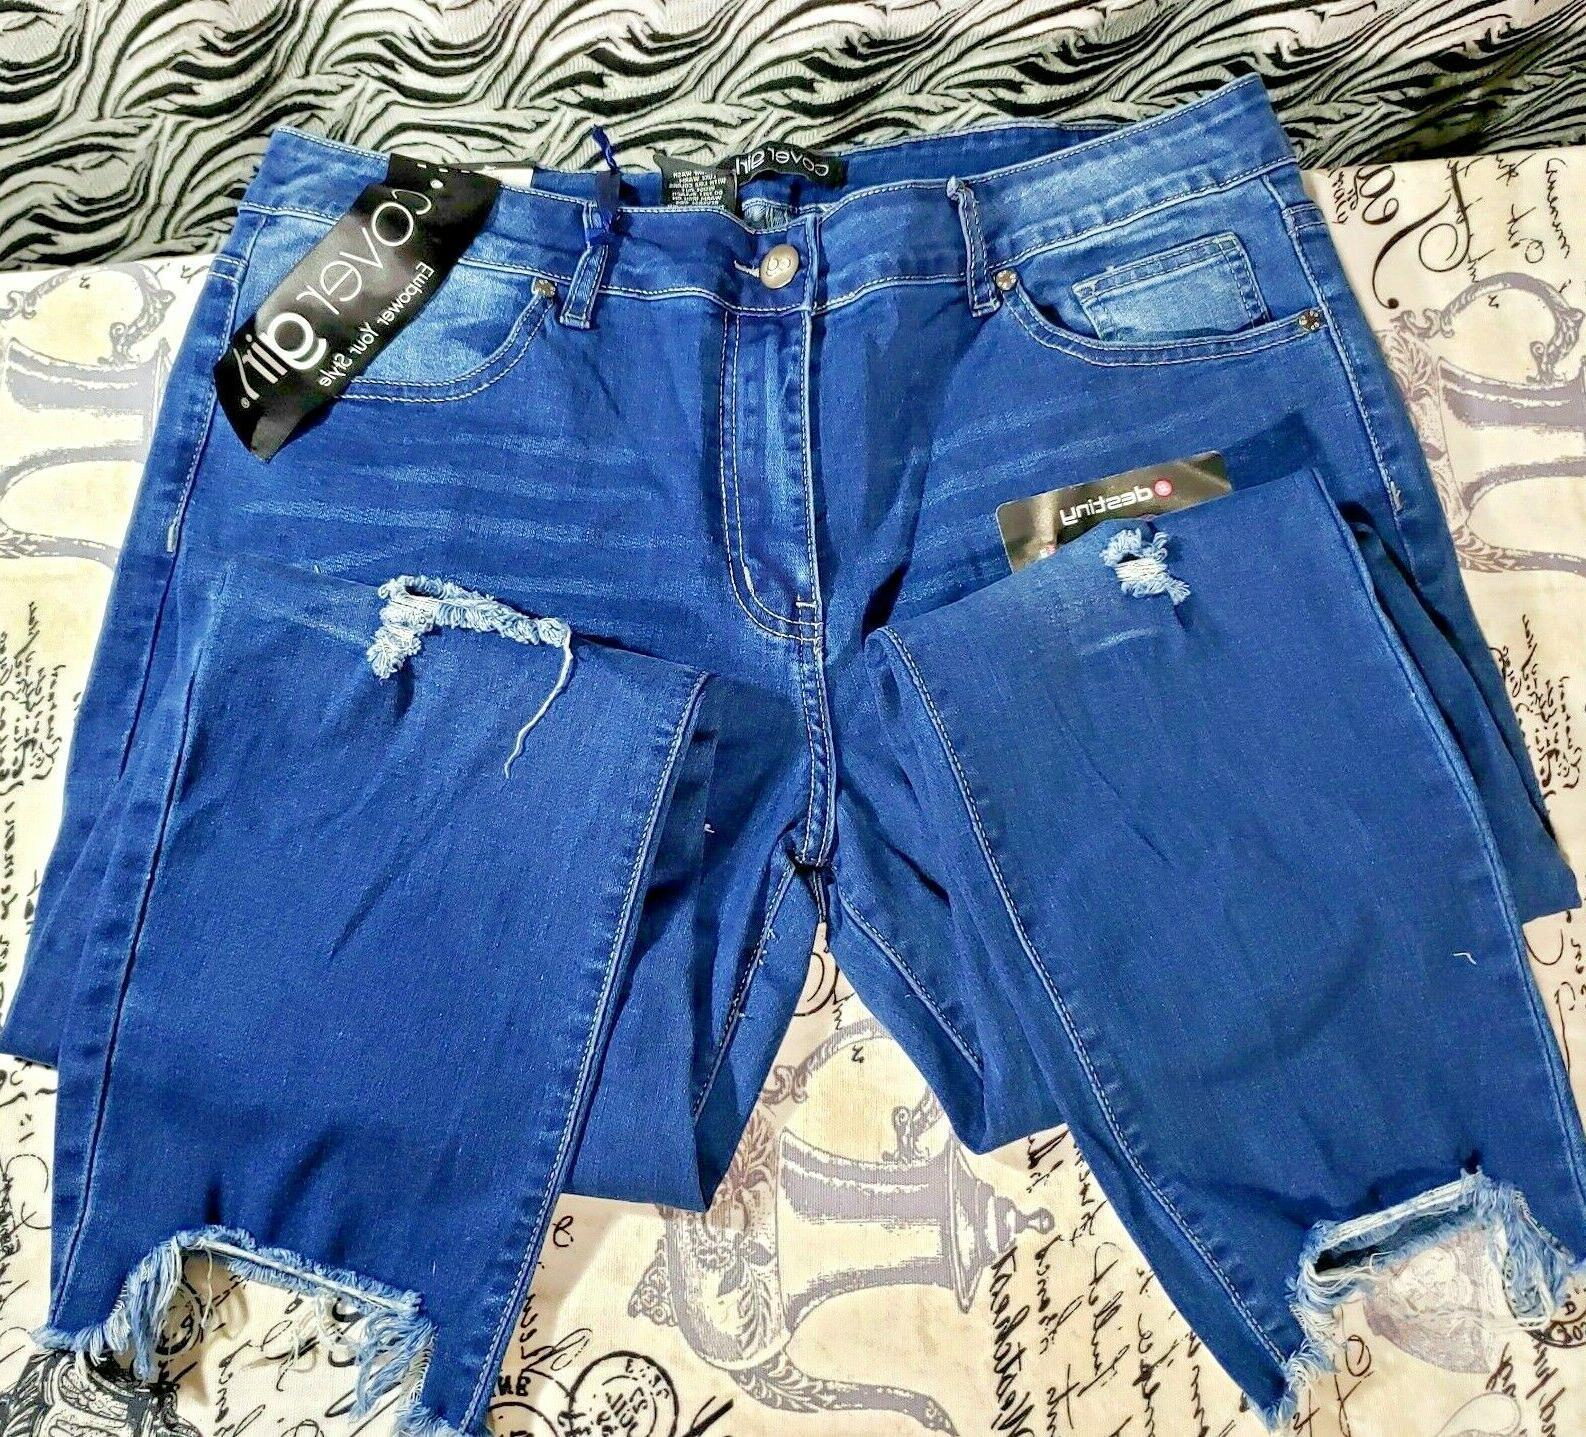 CG Jeans Patched Blue Denim Skinny Plus Wash